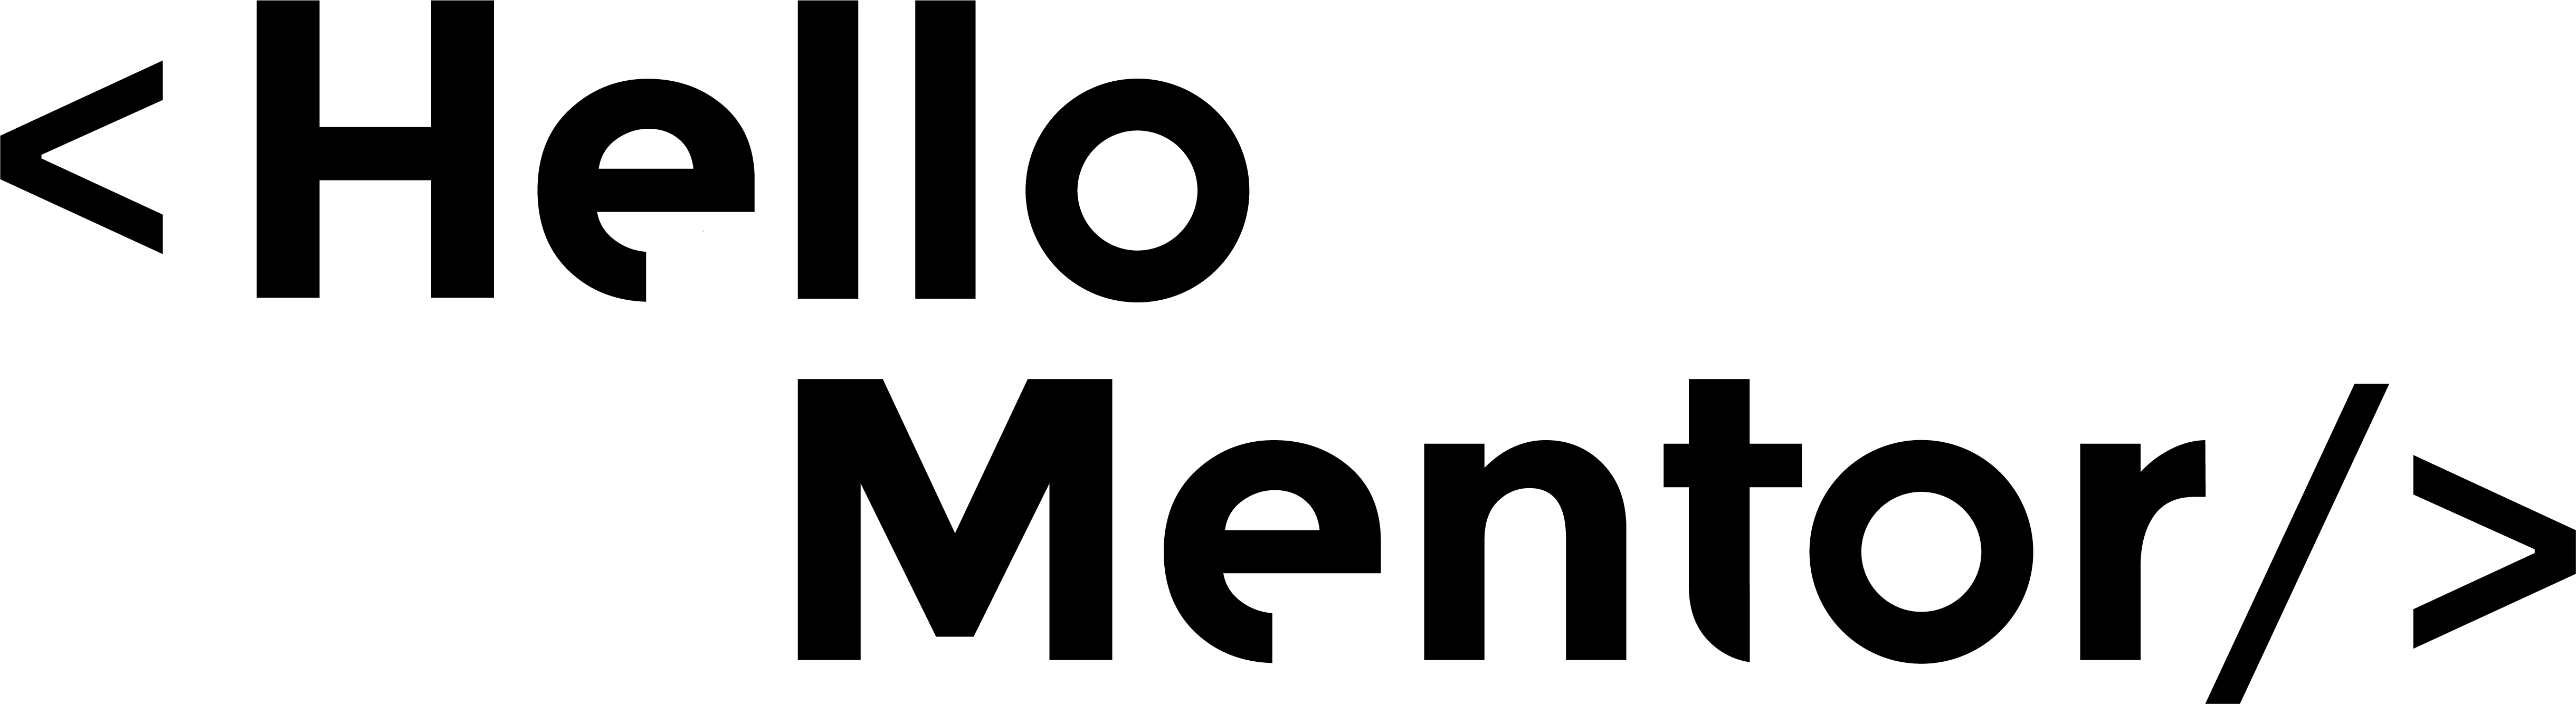 HelloMentor-logo-black